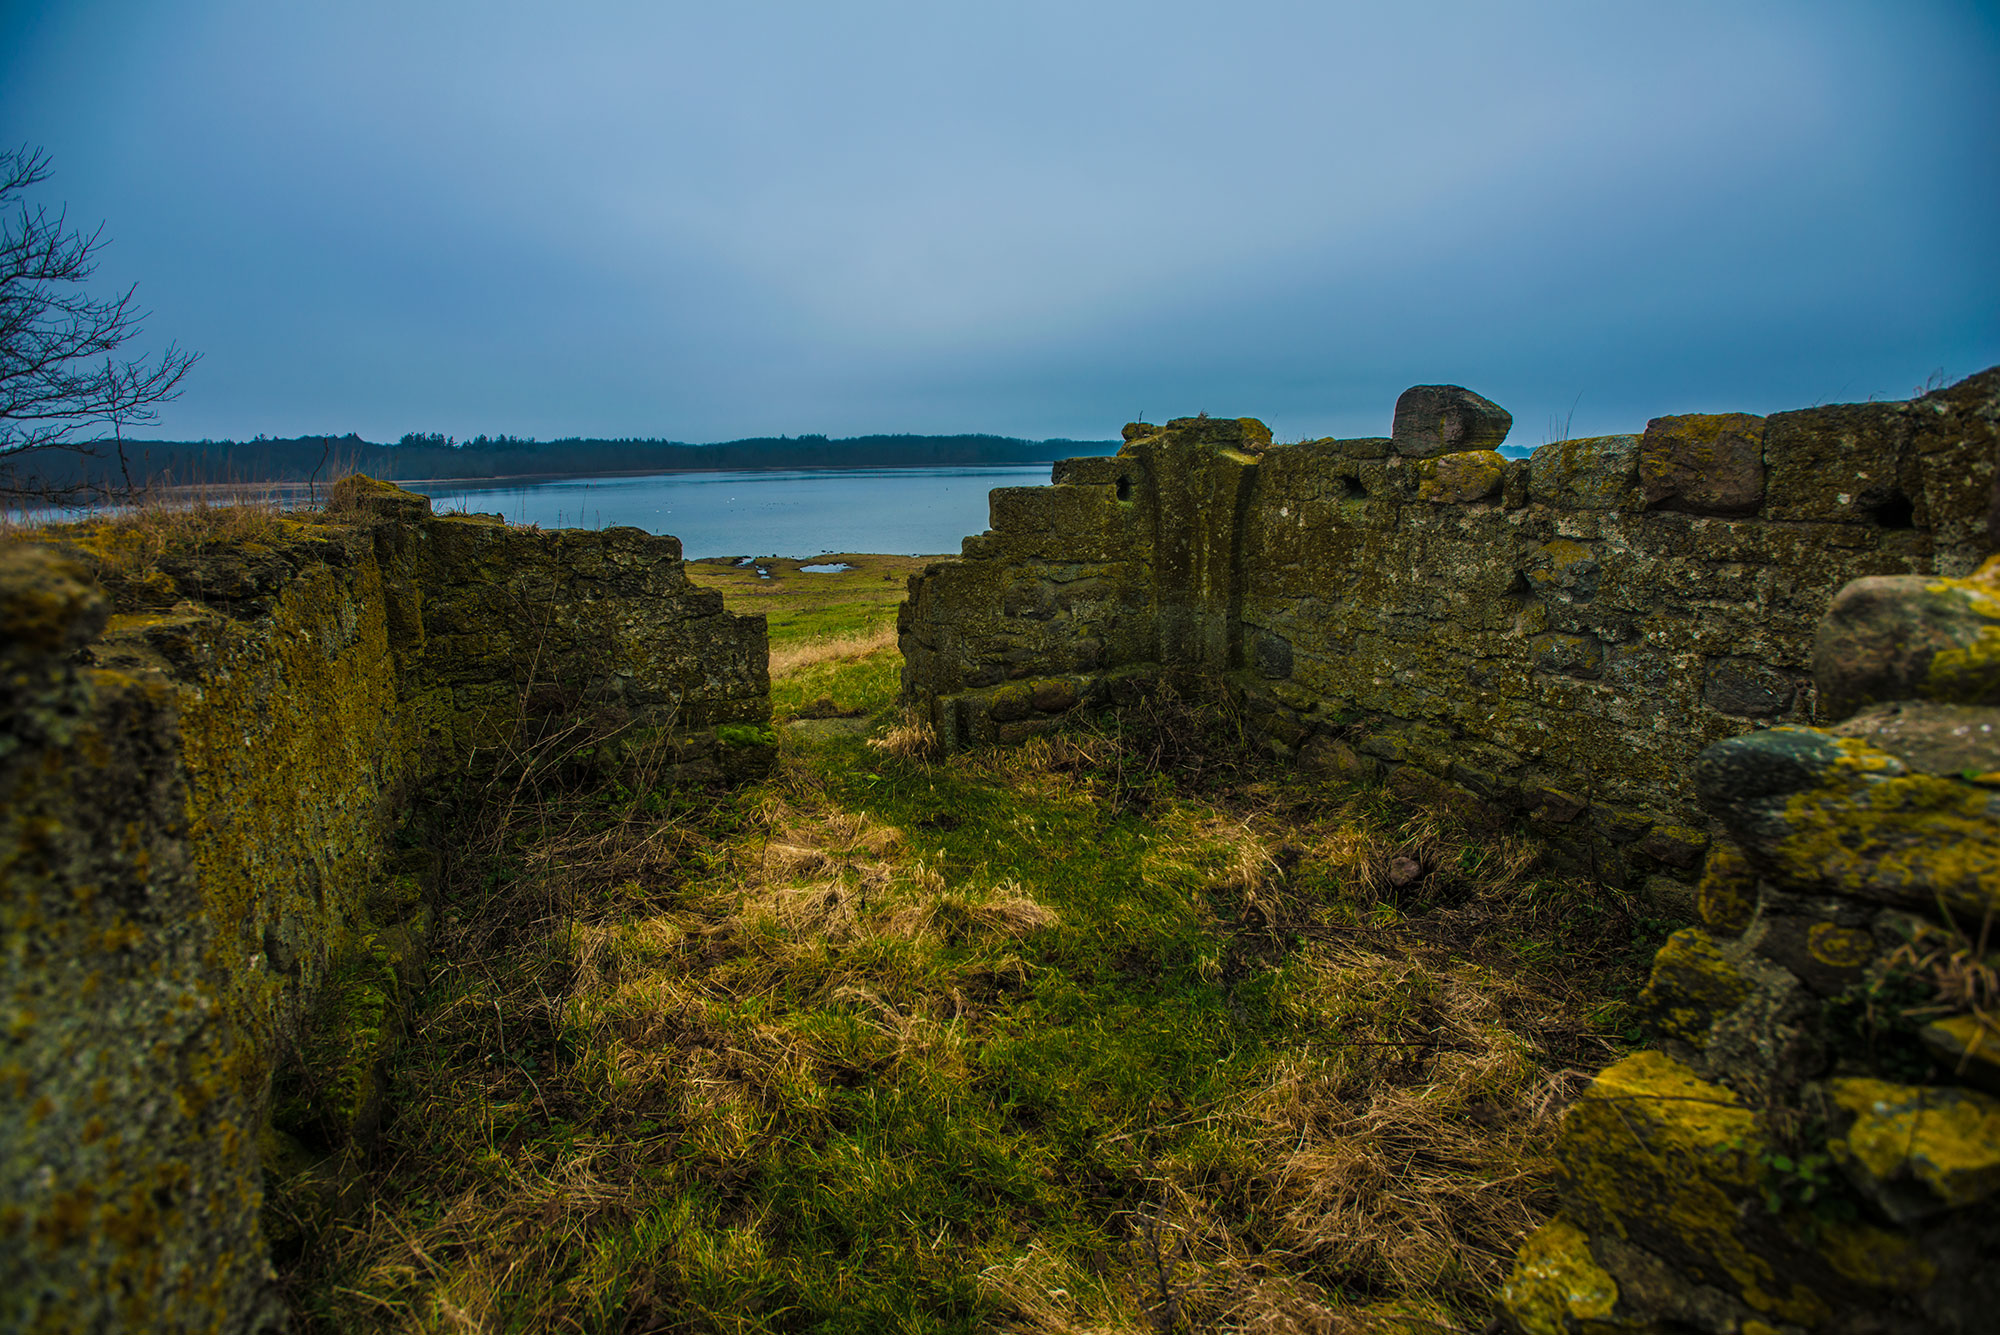 Eskilsø Kloster